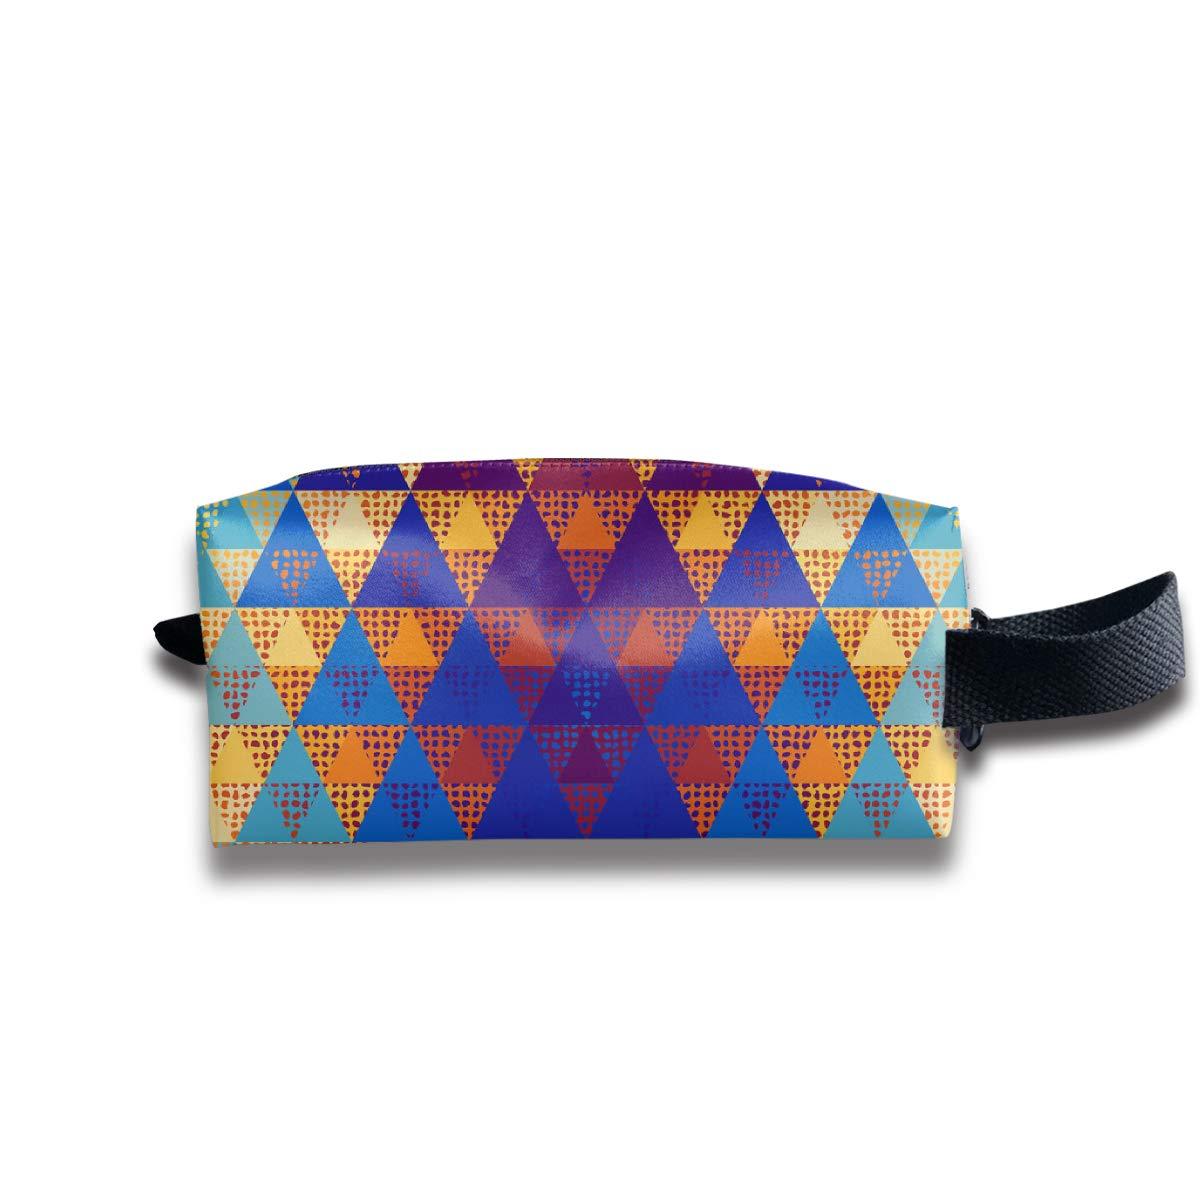 A Triangles_464 Canvas Makeup Bag Pouch Purse Handbag Organizer with Zipper